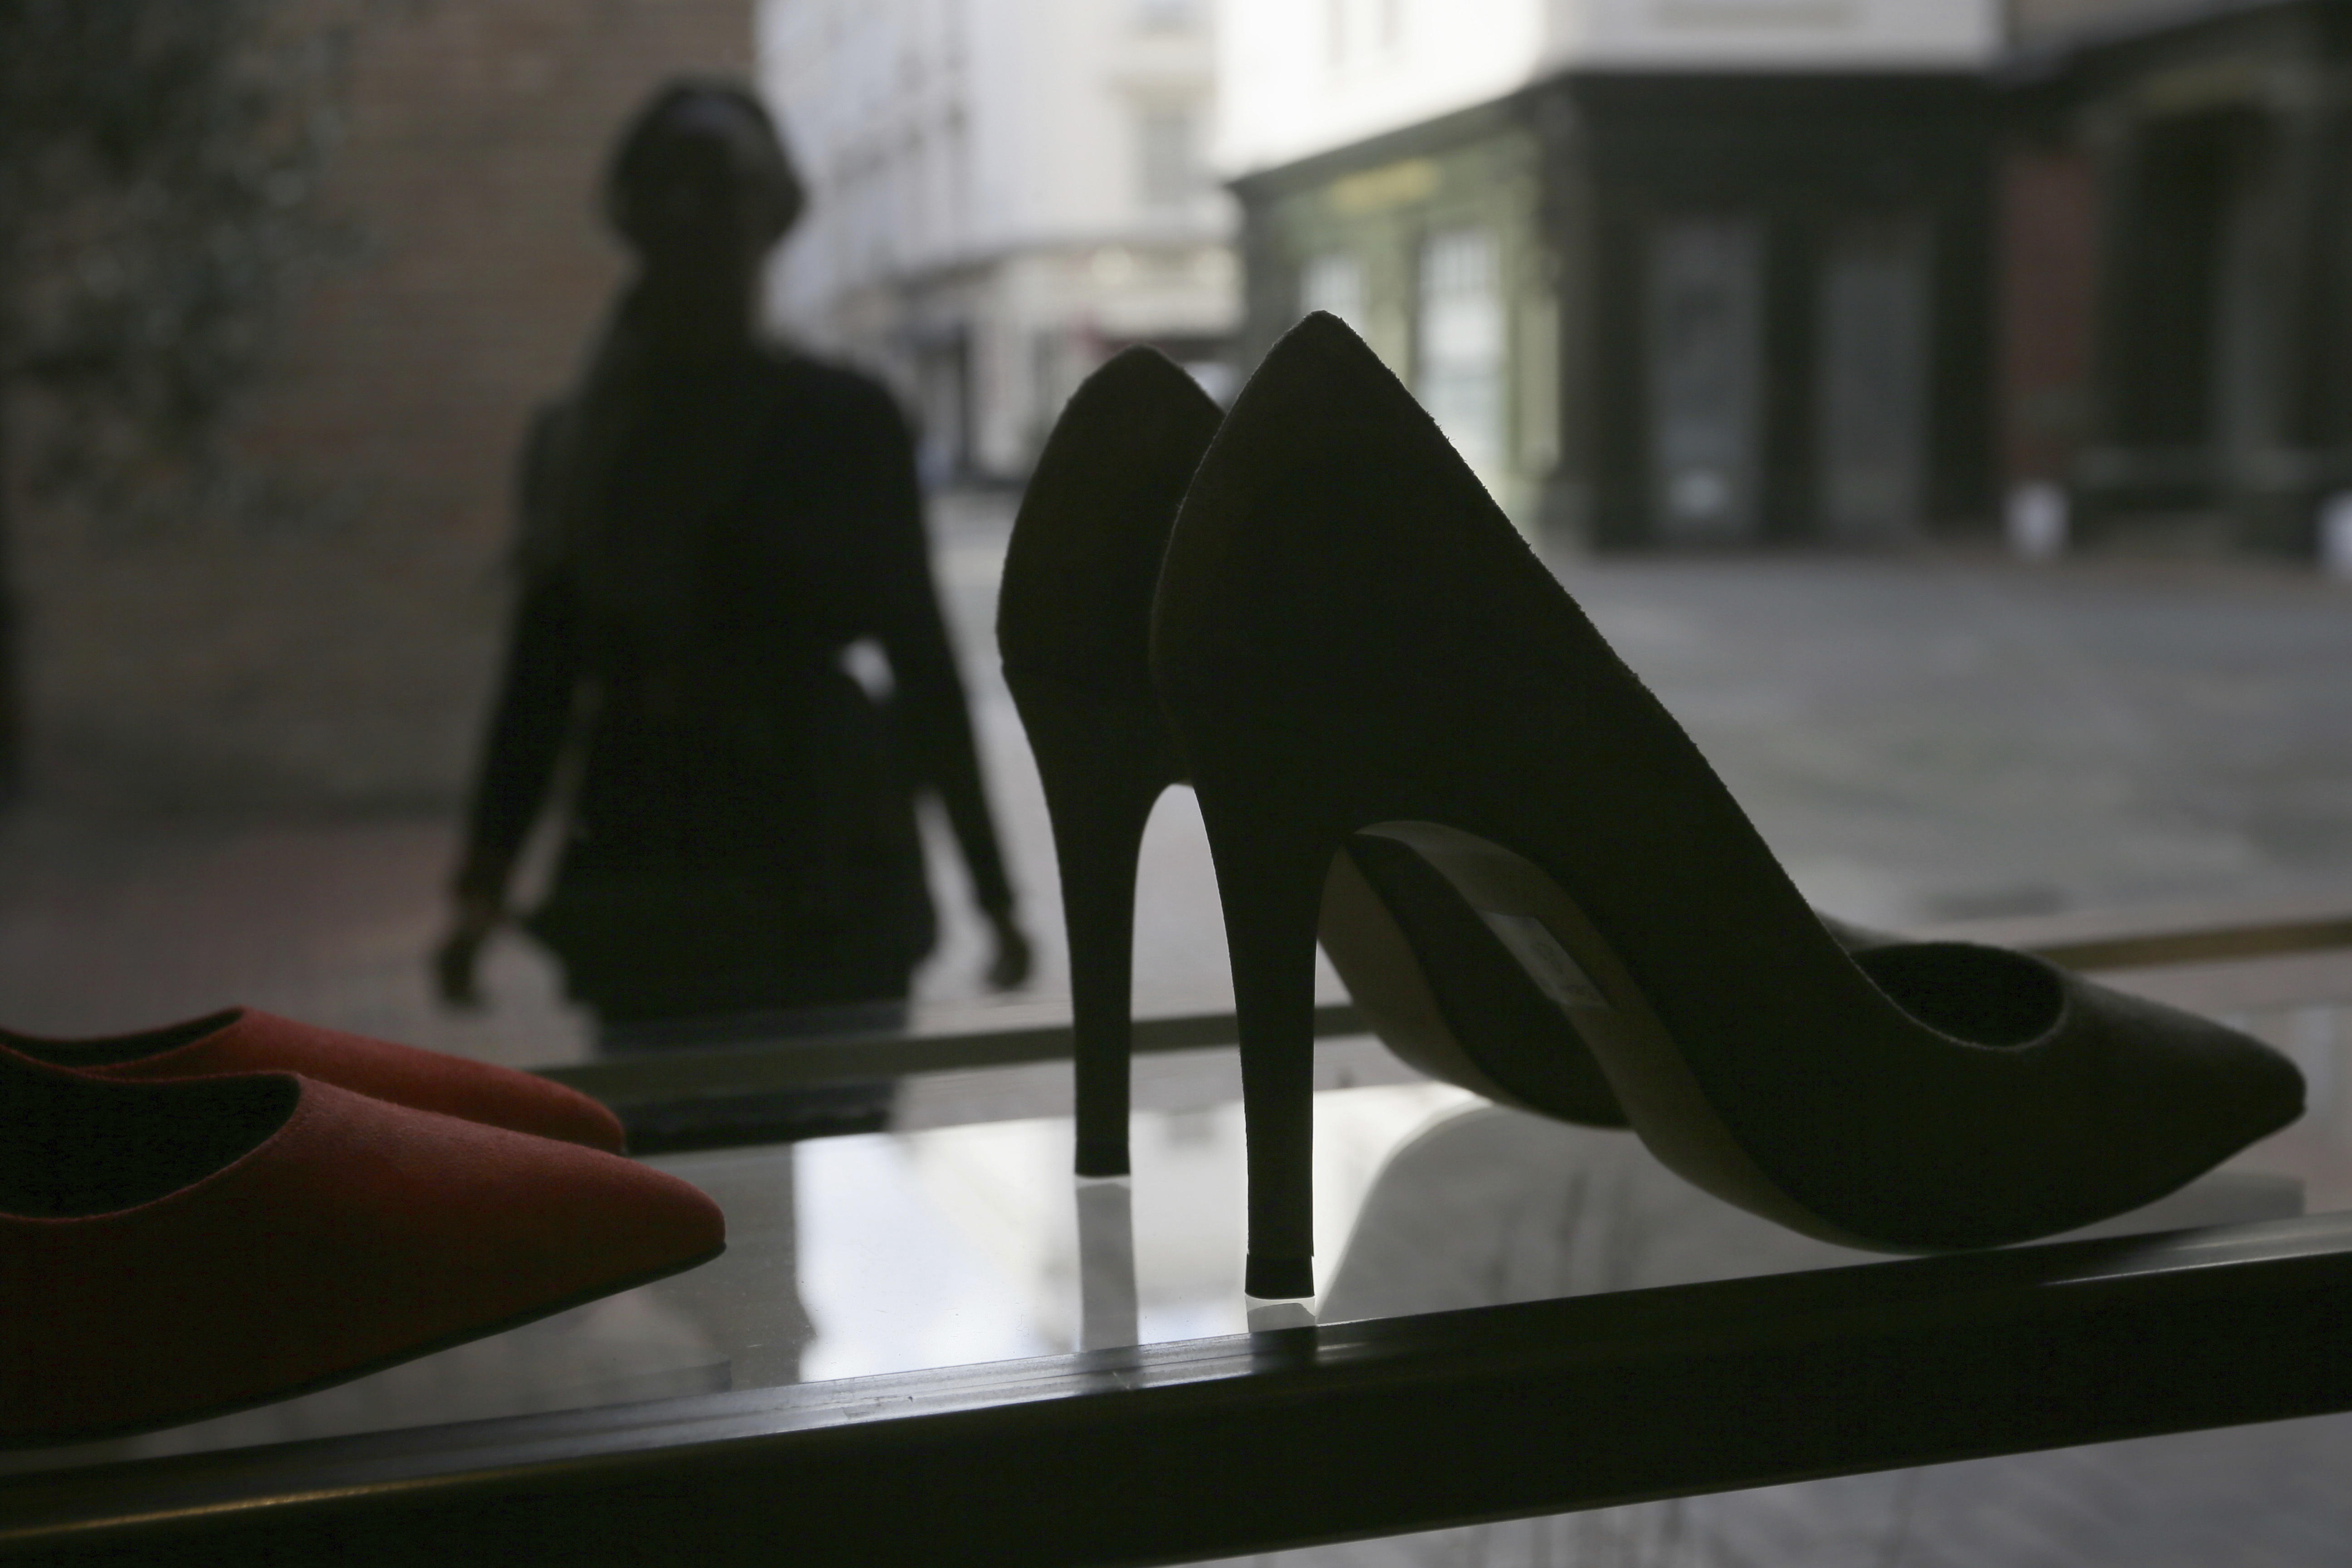 High heels controversy: British lawmakers debate